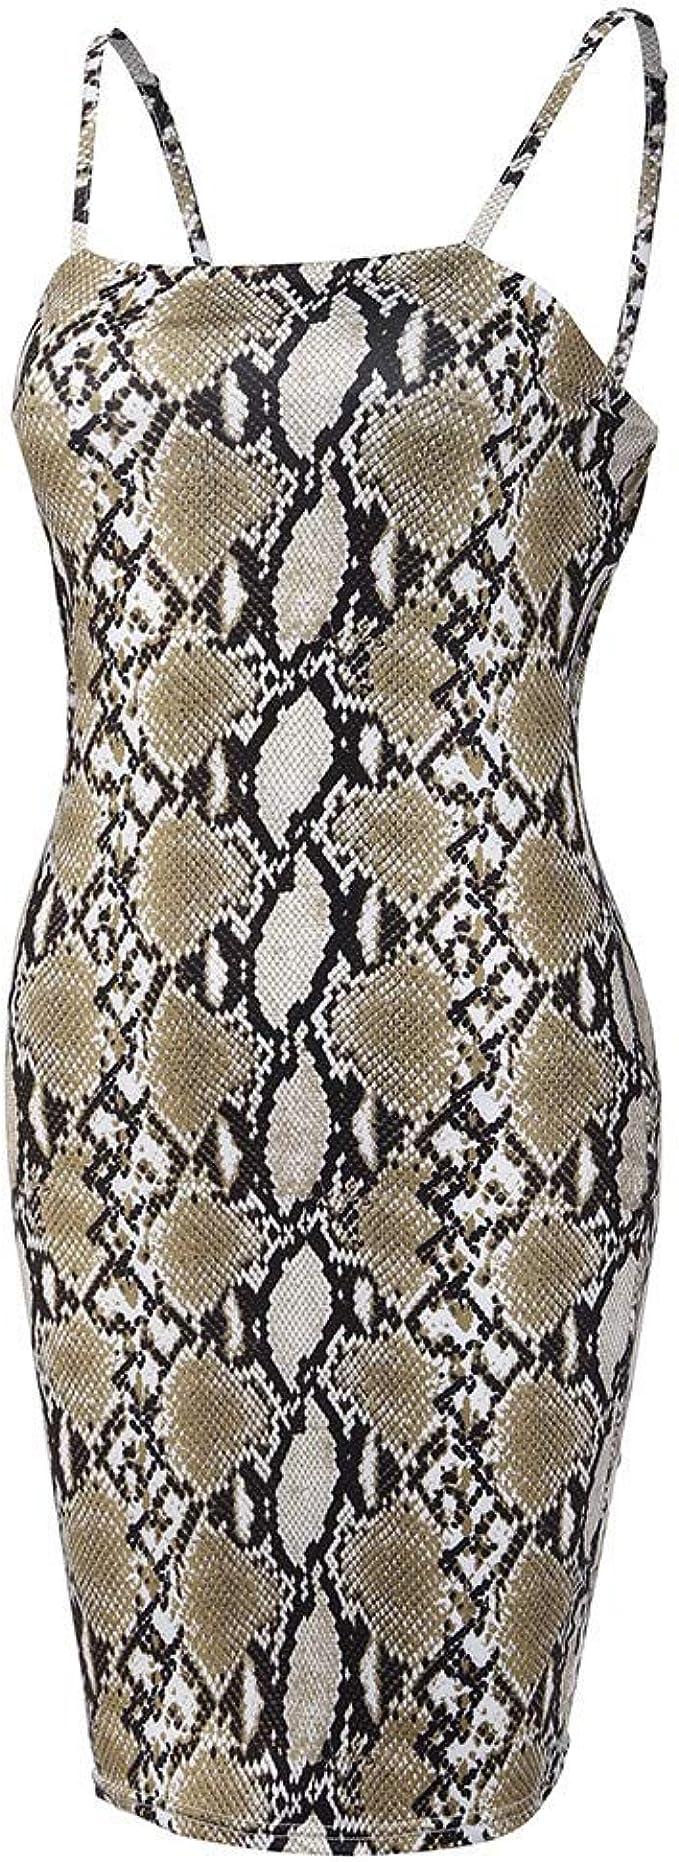 BNisBM Women Spaghetti Strap Sleeveless Serpentine Printing Tight Backless Summe Bodycon Midi Dress